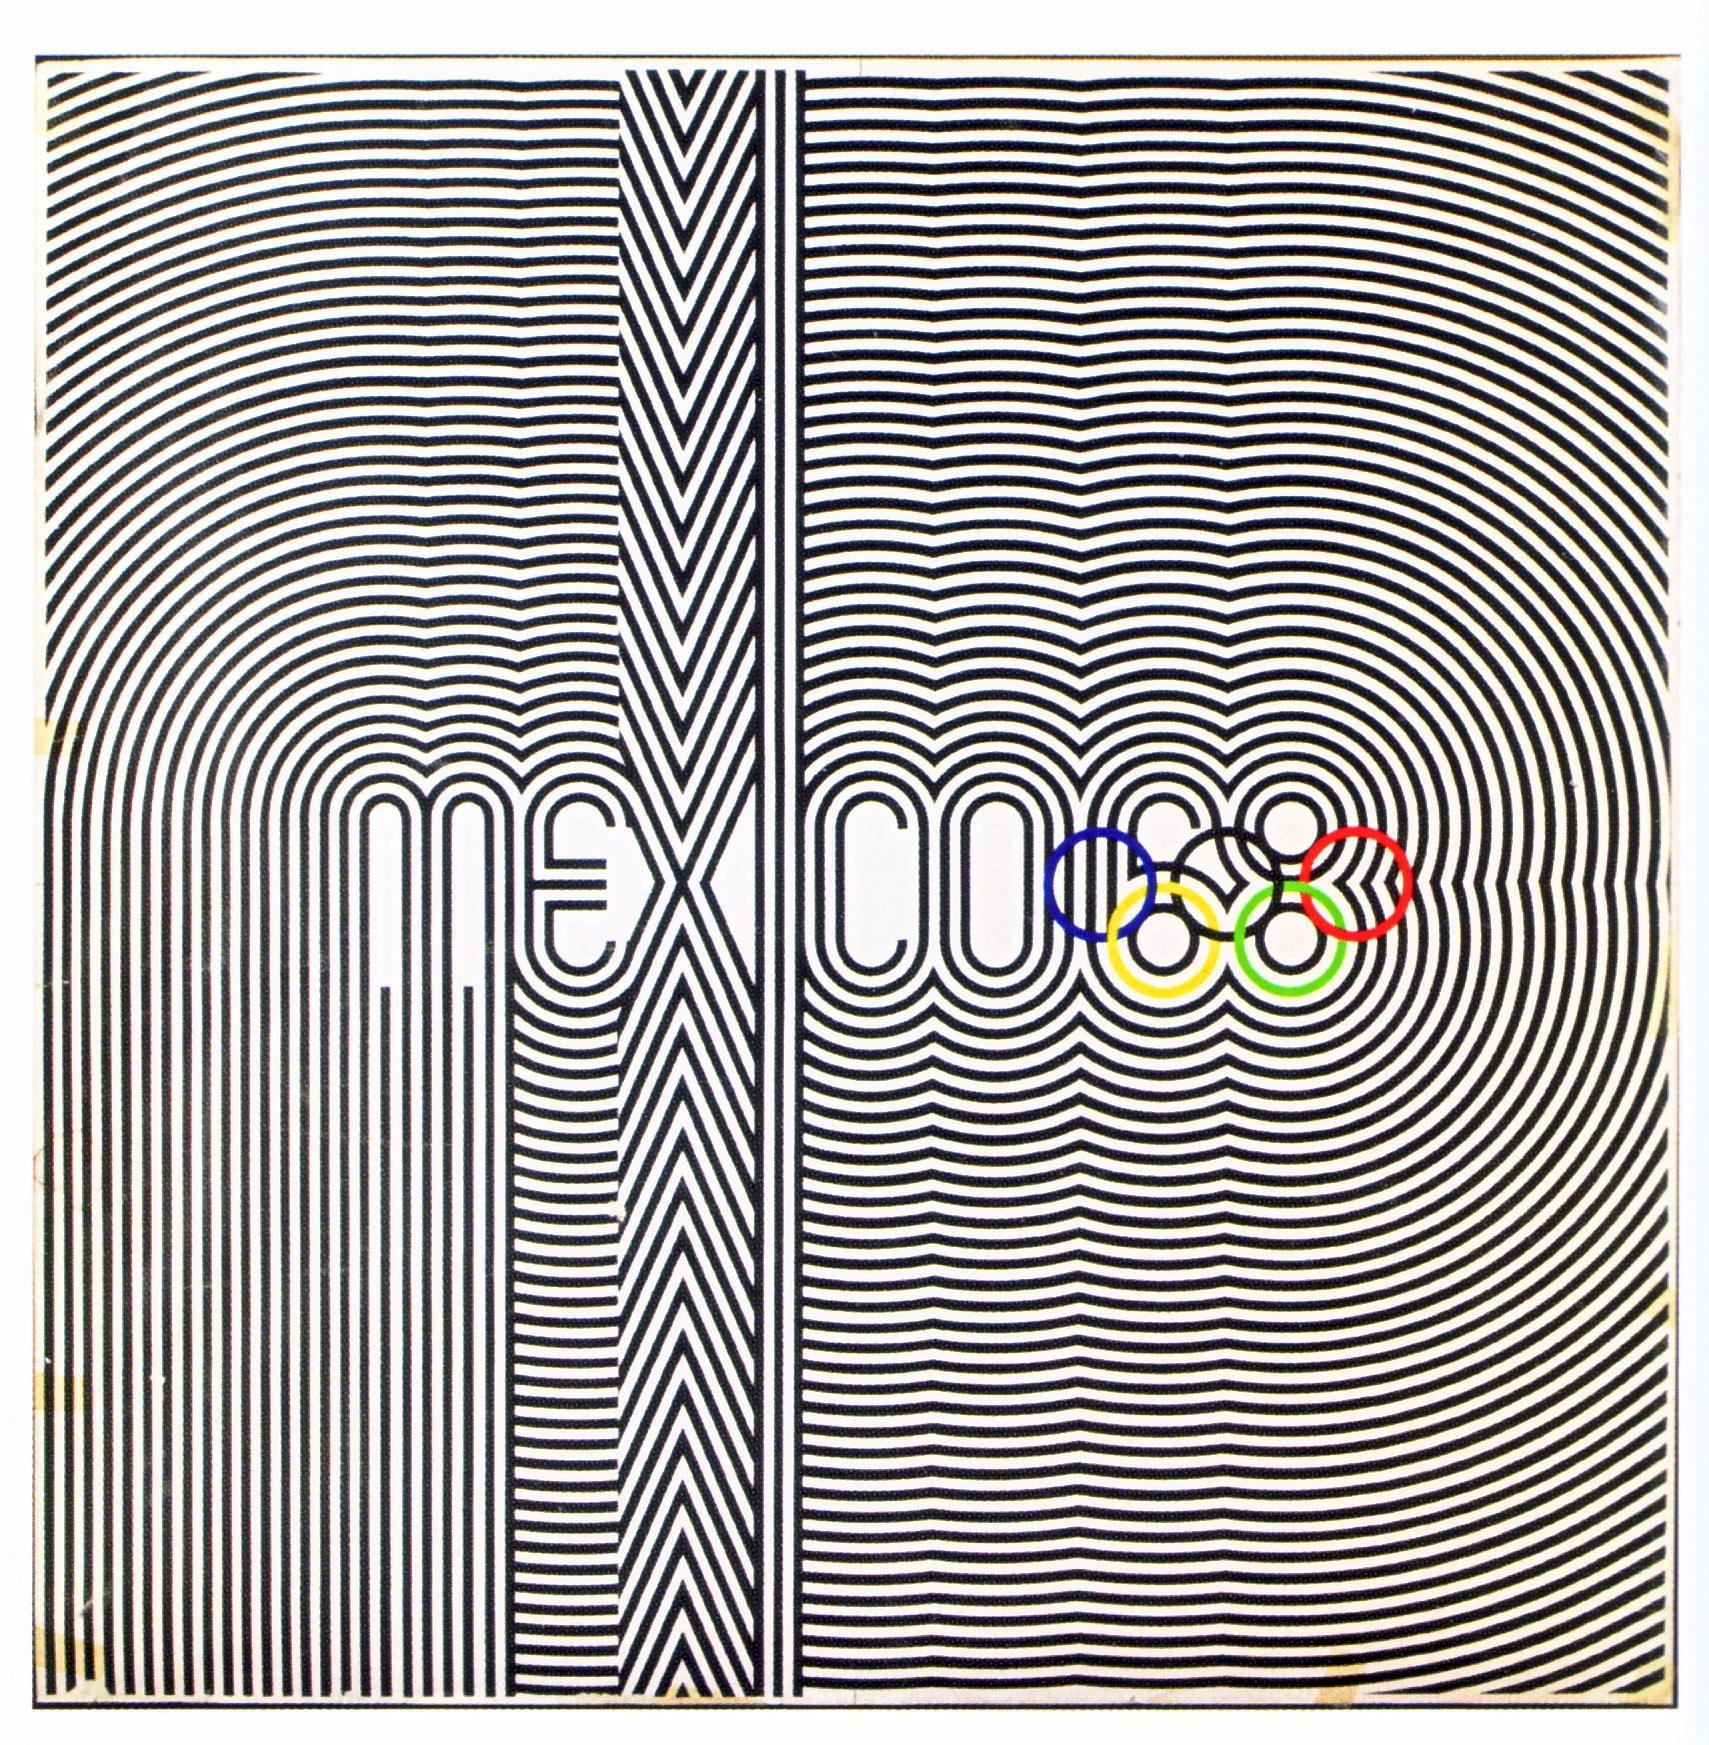 1968Mexico2.jpg (1709×1745)